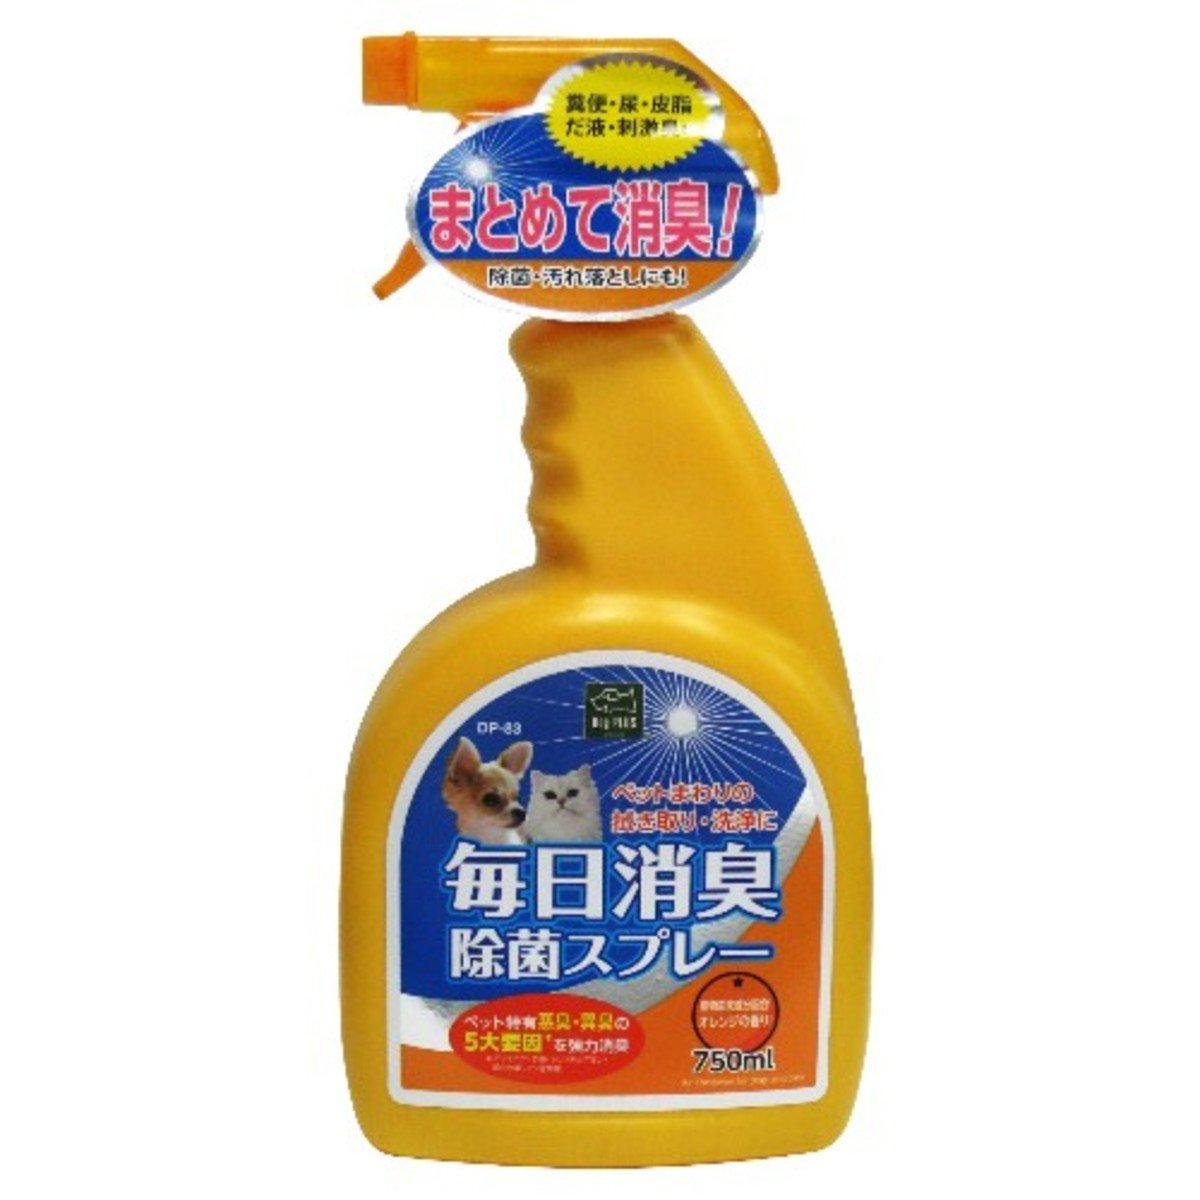 MR53684 日本 MARUKAN 香橙味消臭噴霧